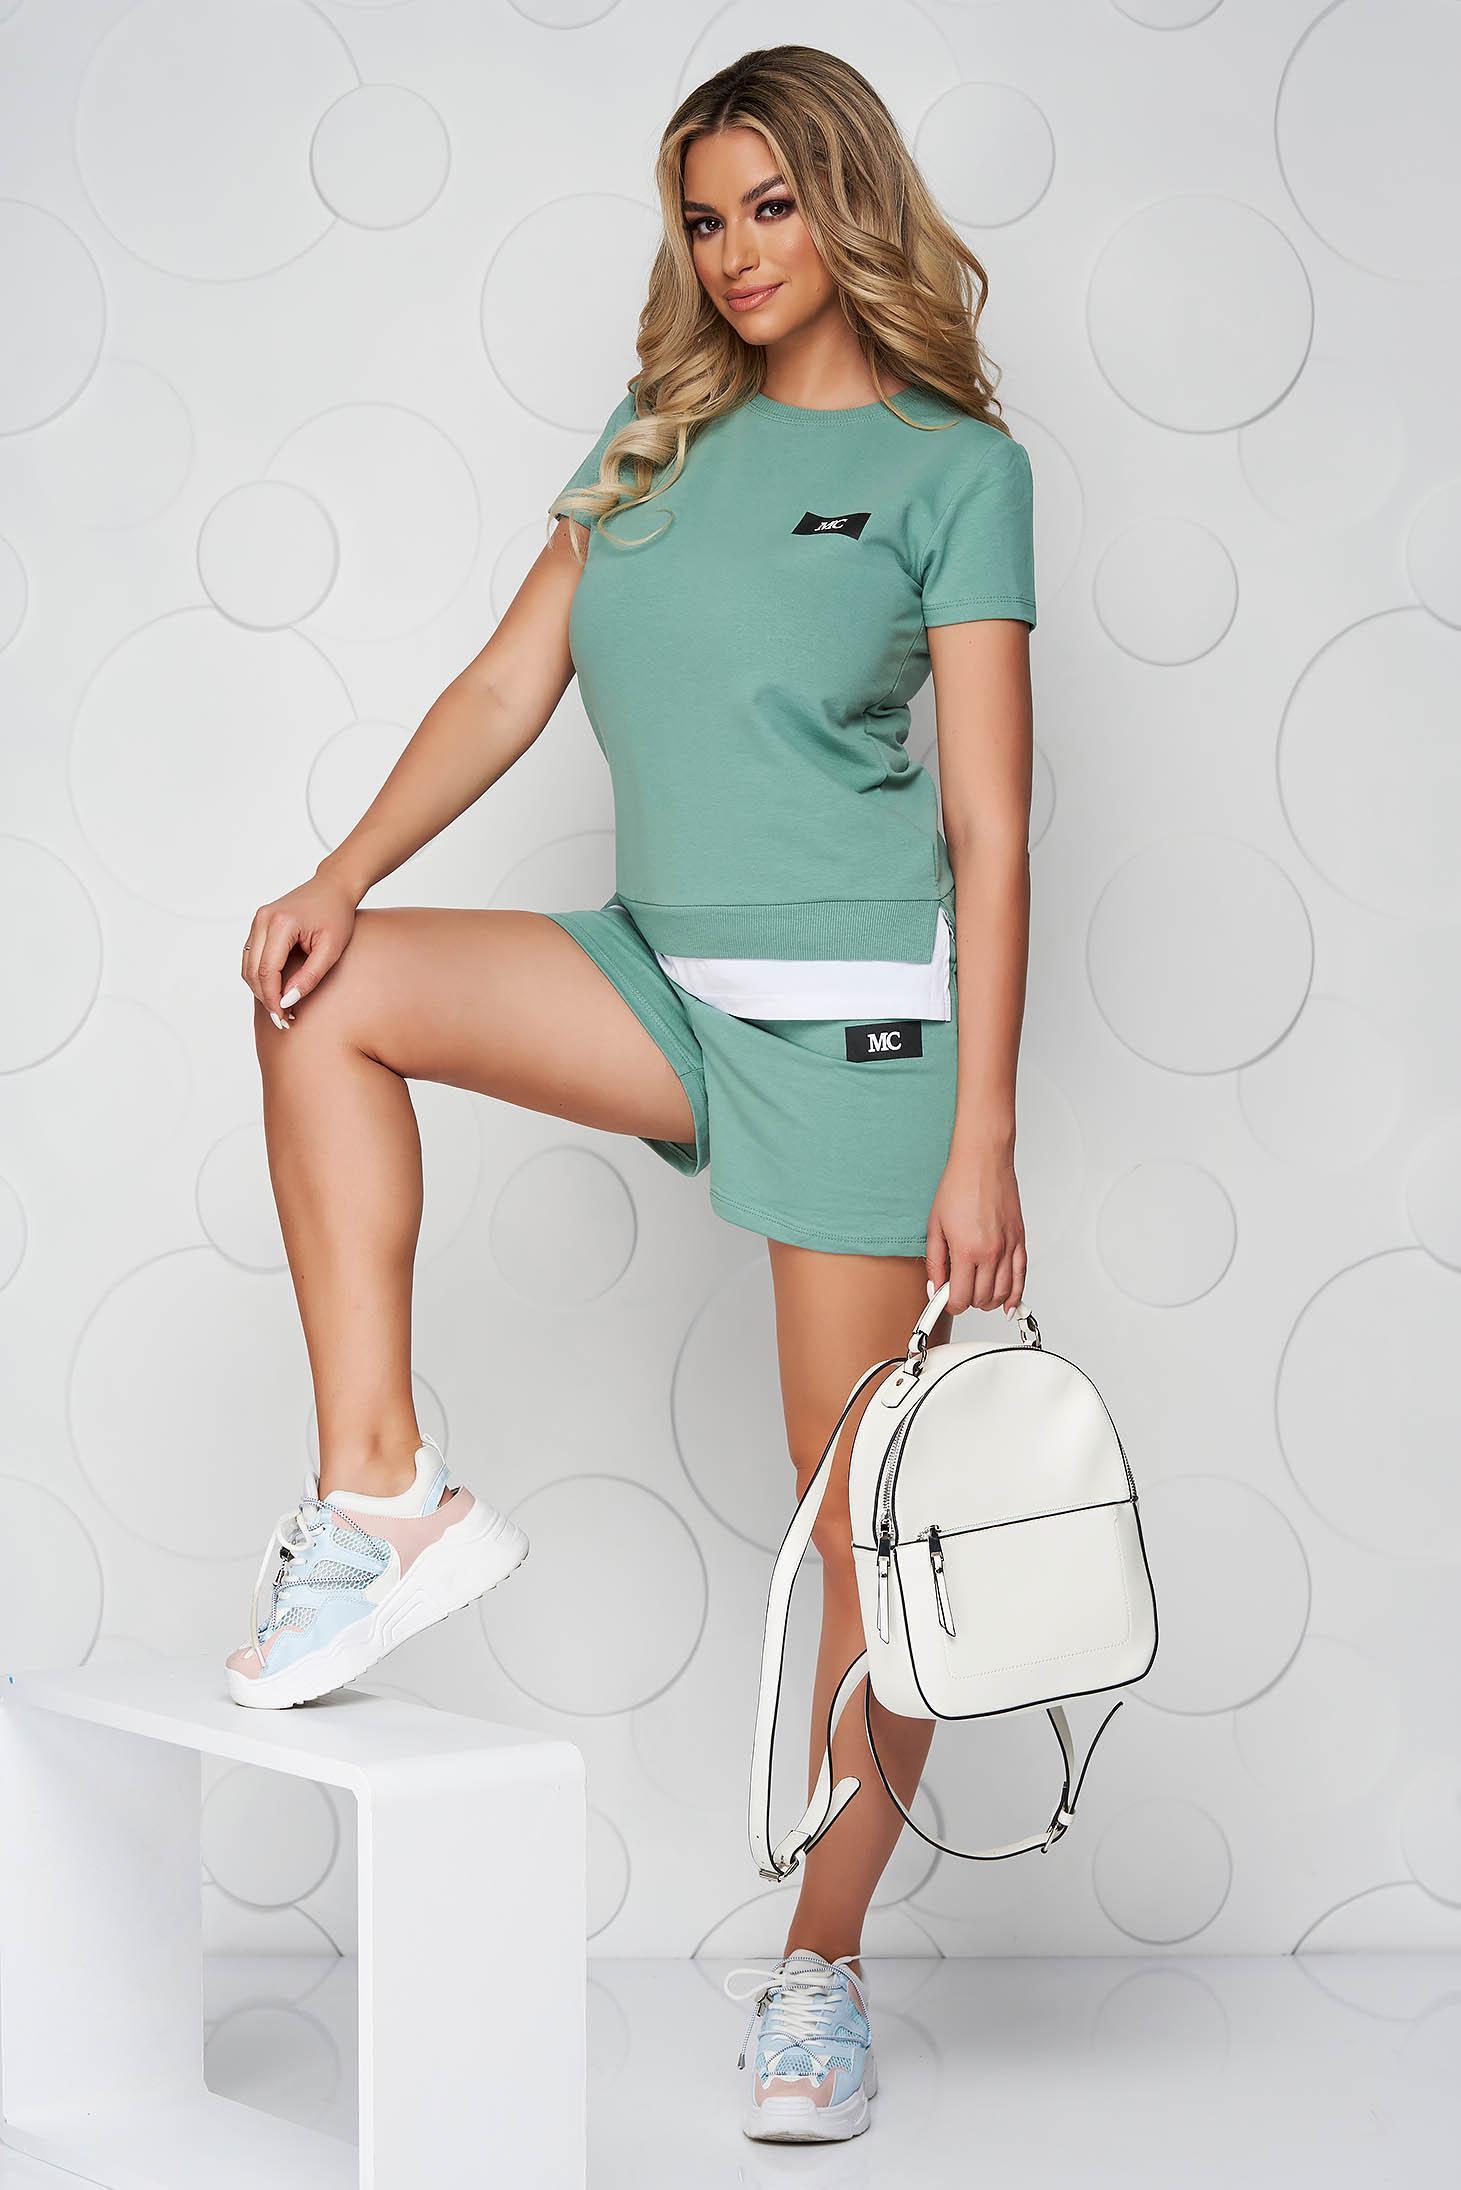 Green sport 2 pieces cotton women`s shorts women`s t-shirt